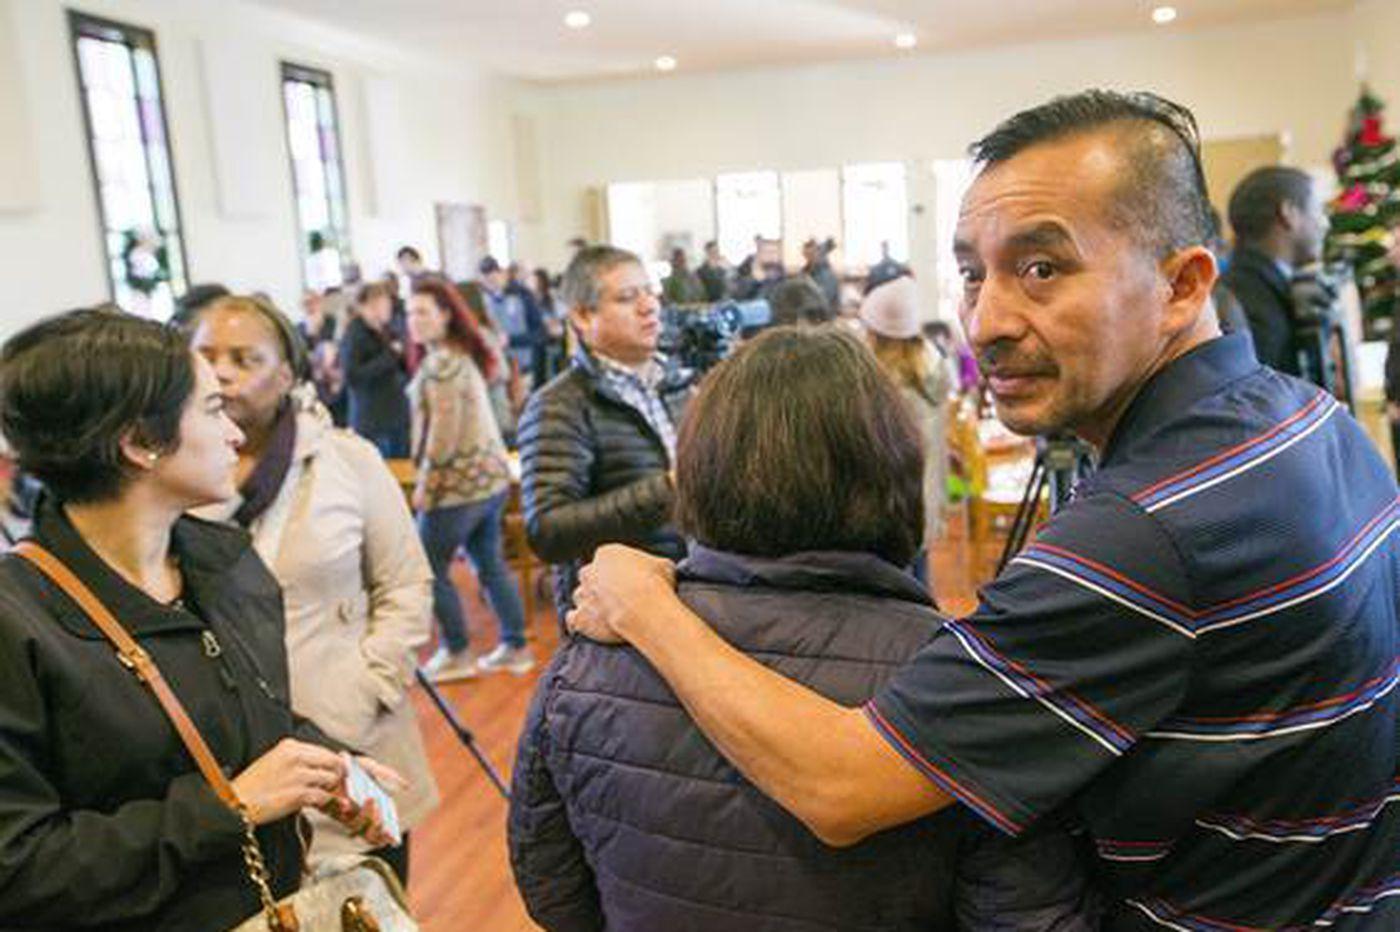 Immigrant deported after seeking refuge in N Carolina church